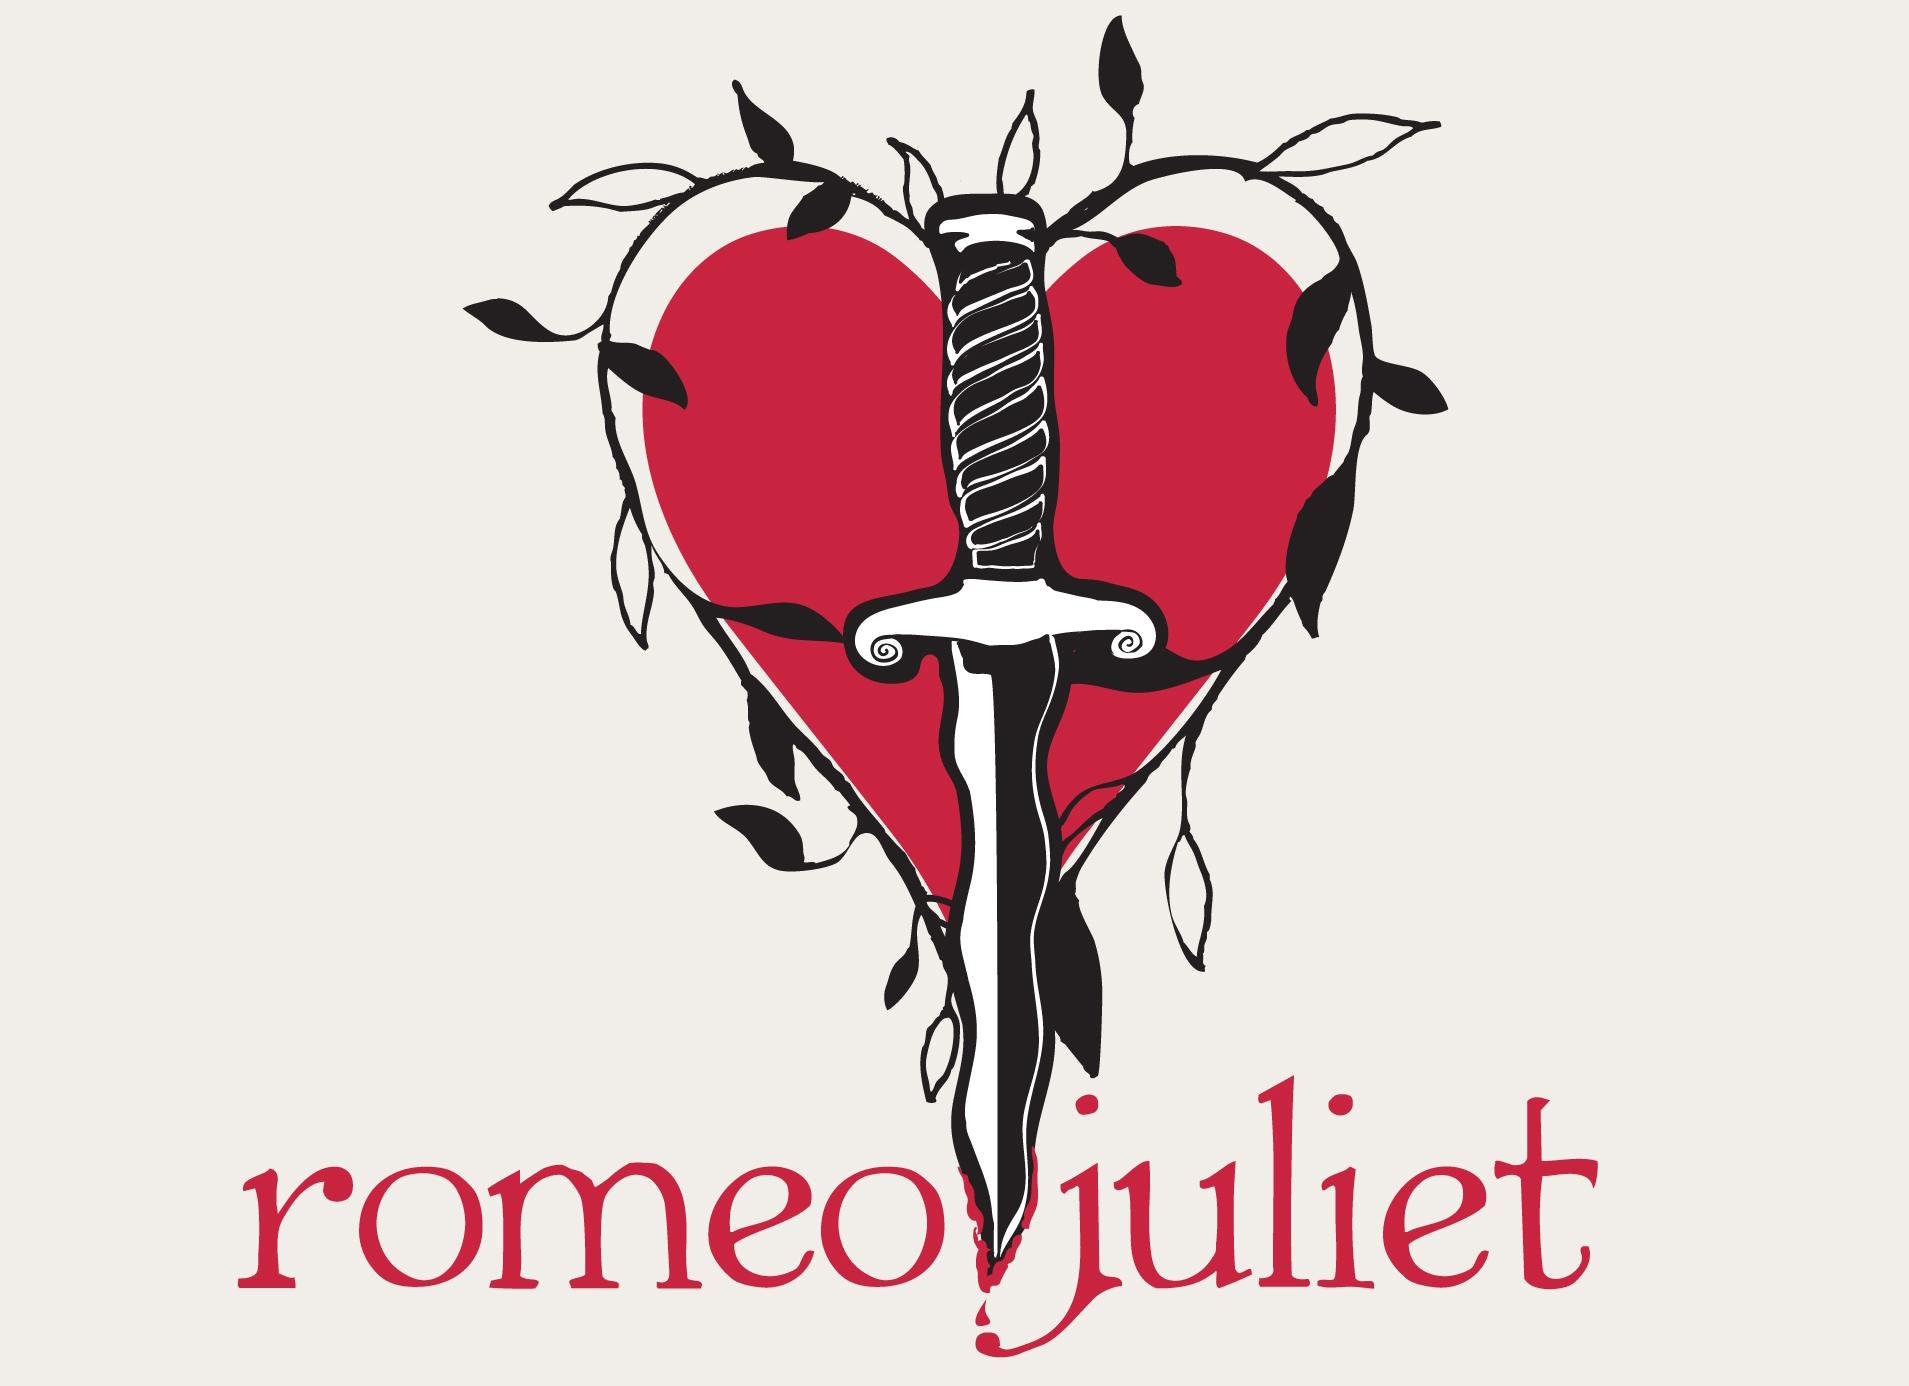 Romeo & Juliet on emaze